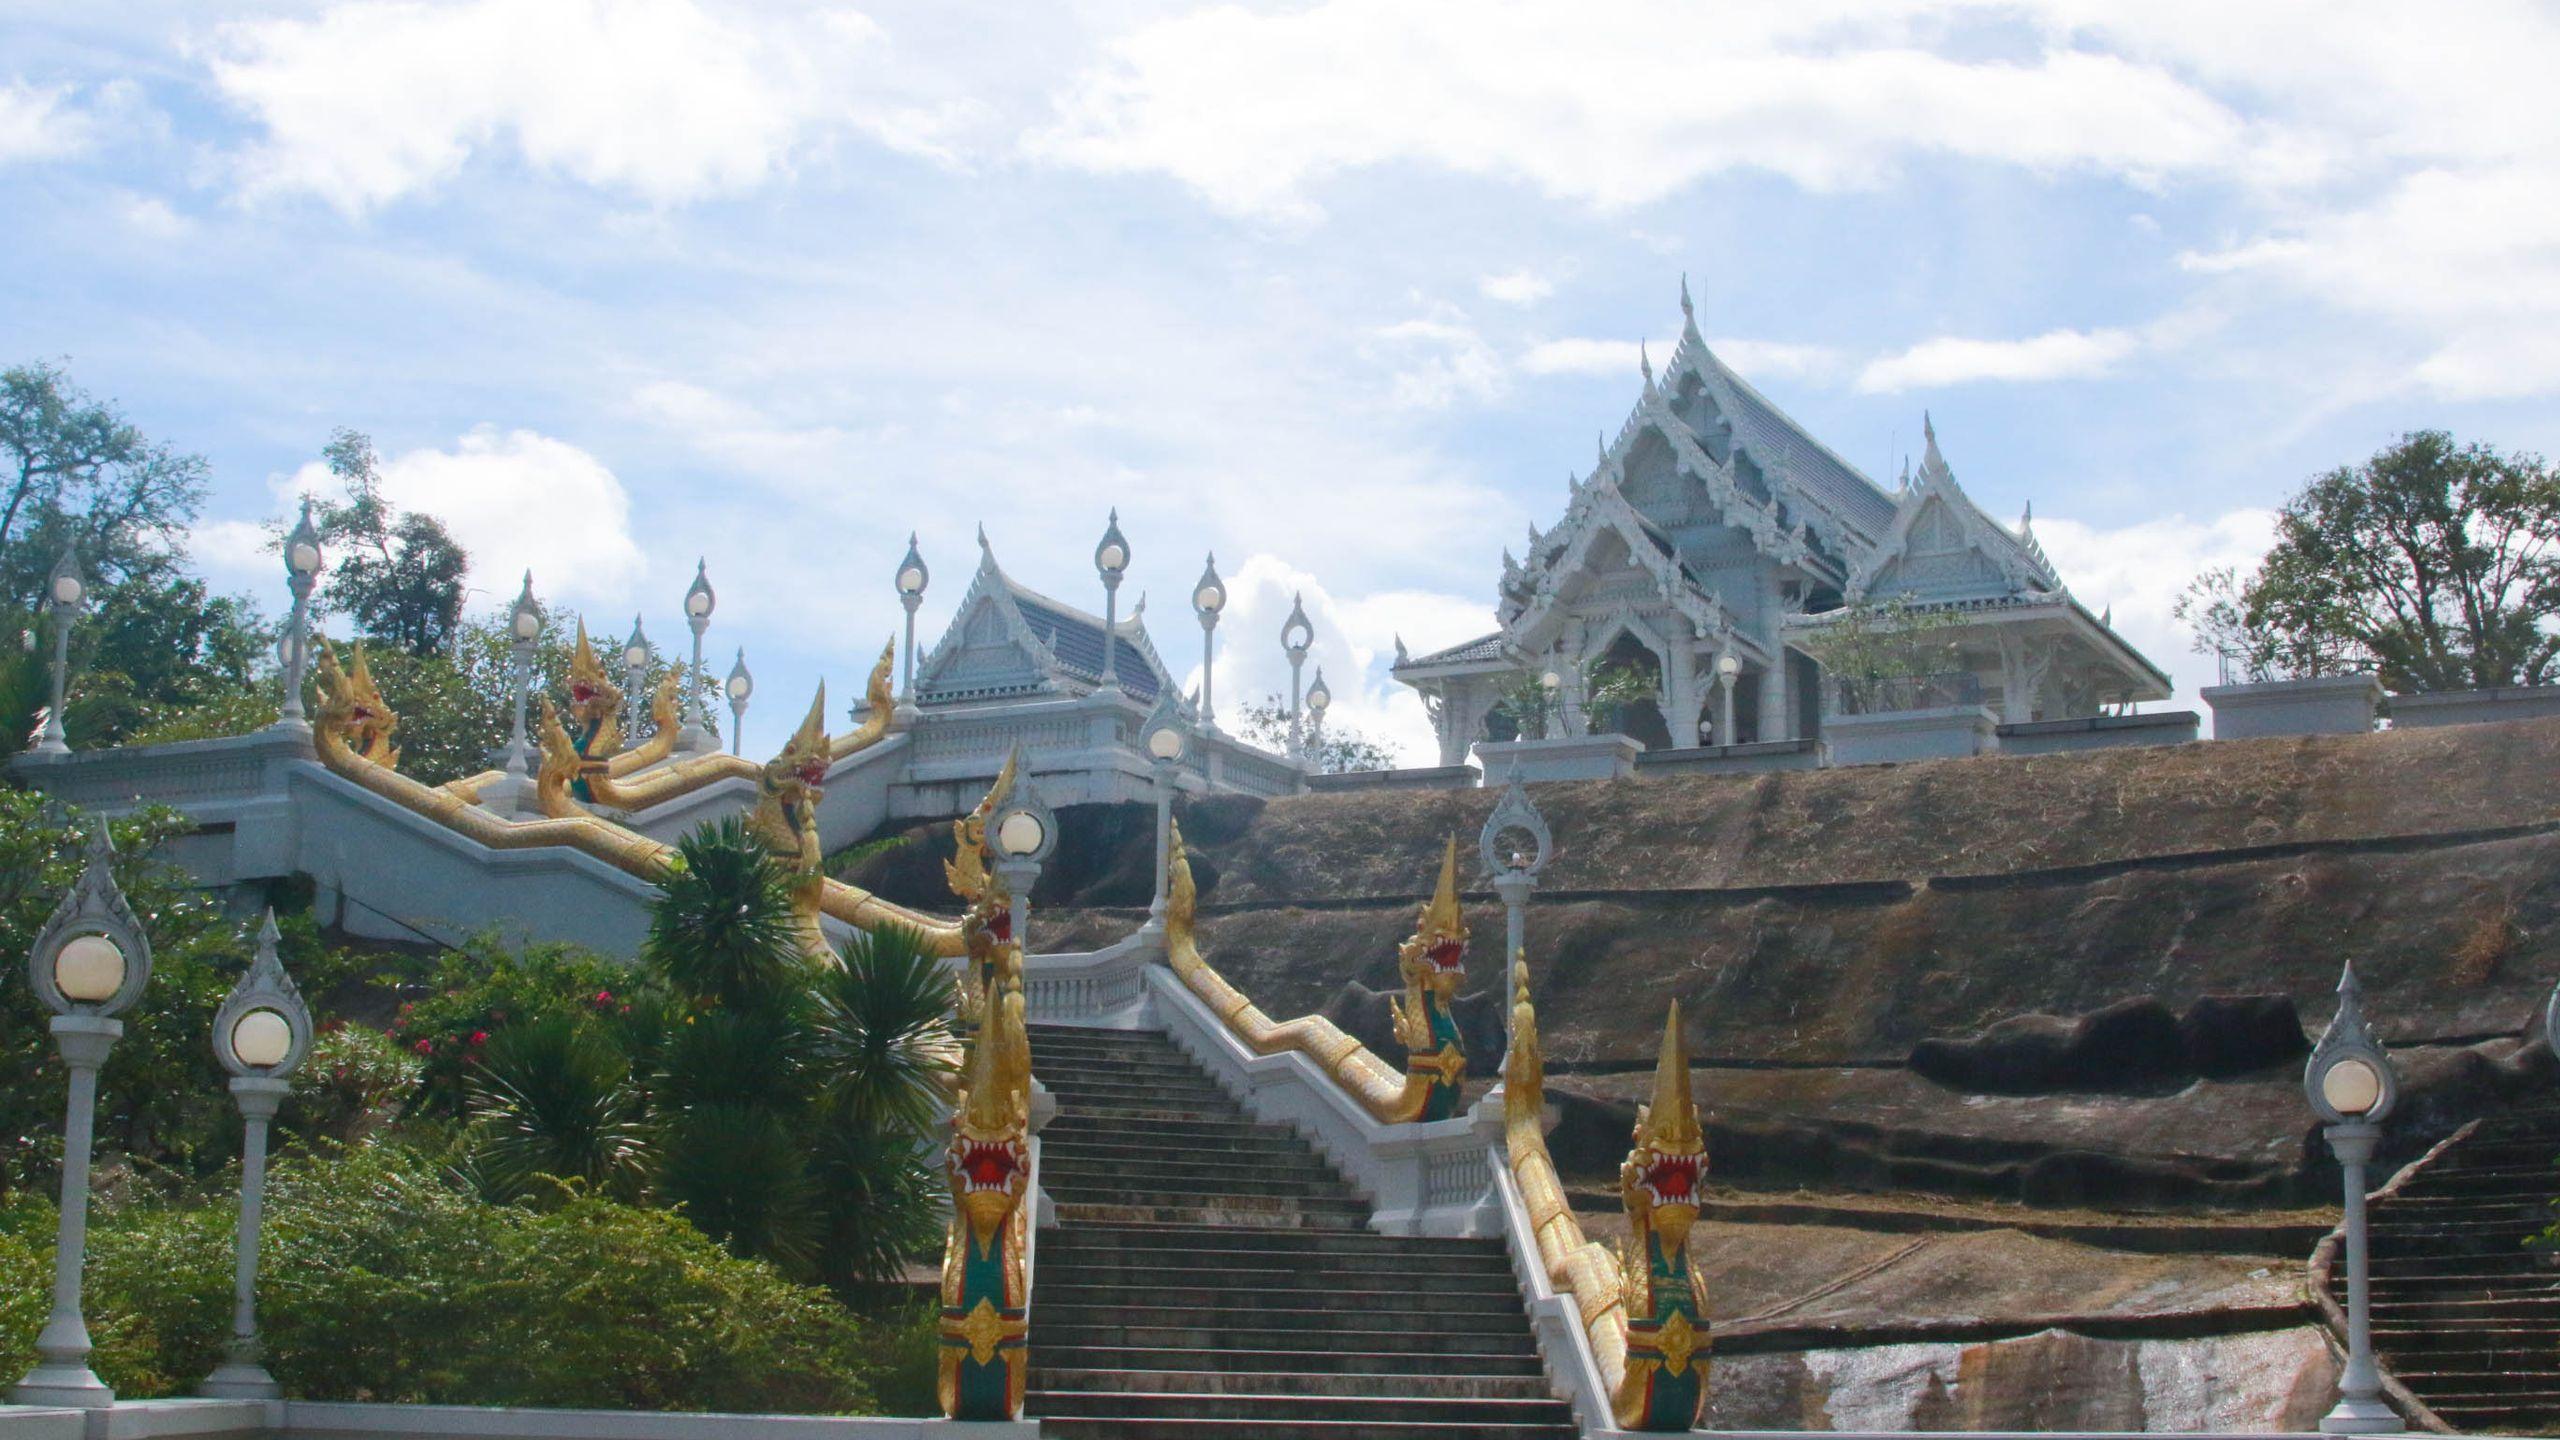 Kaew Korawaram Temple